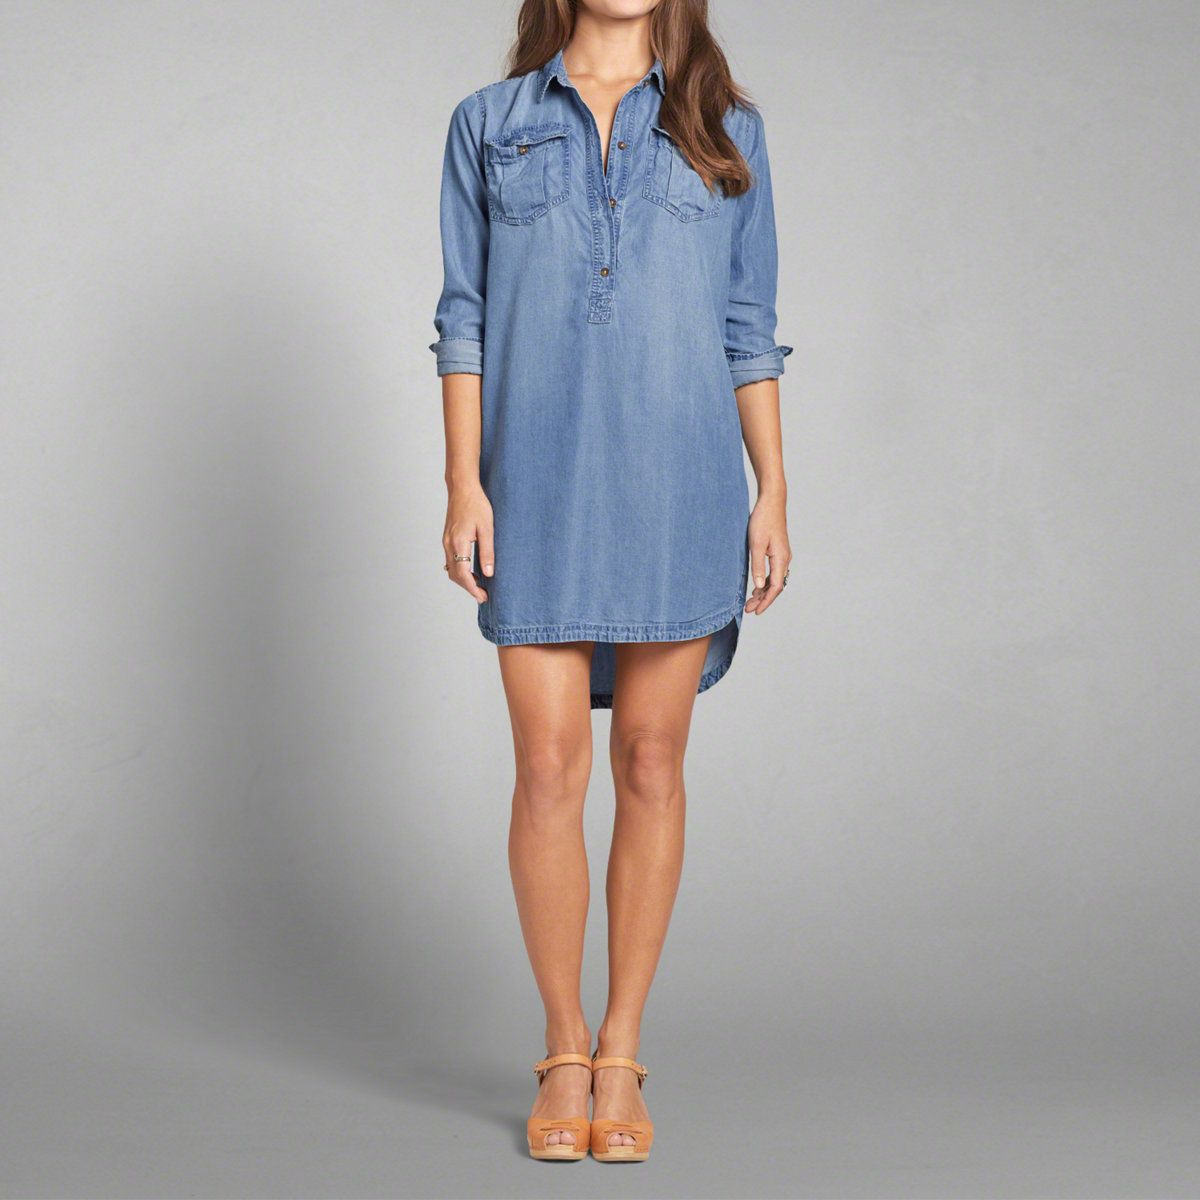 07ec9c905c53 Womens Chambray Shirt Dress